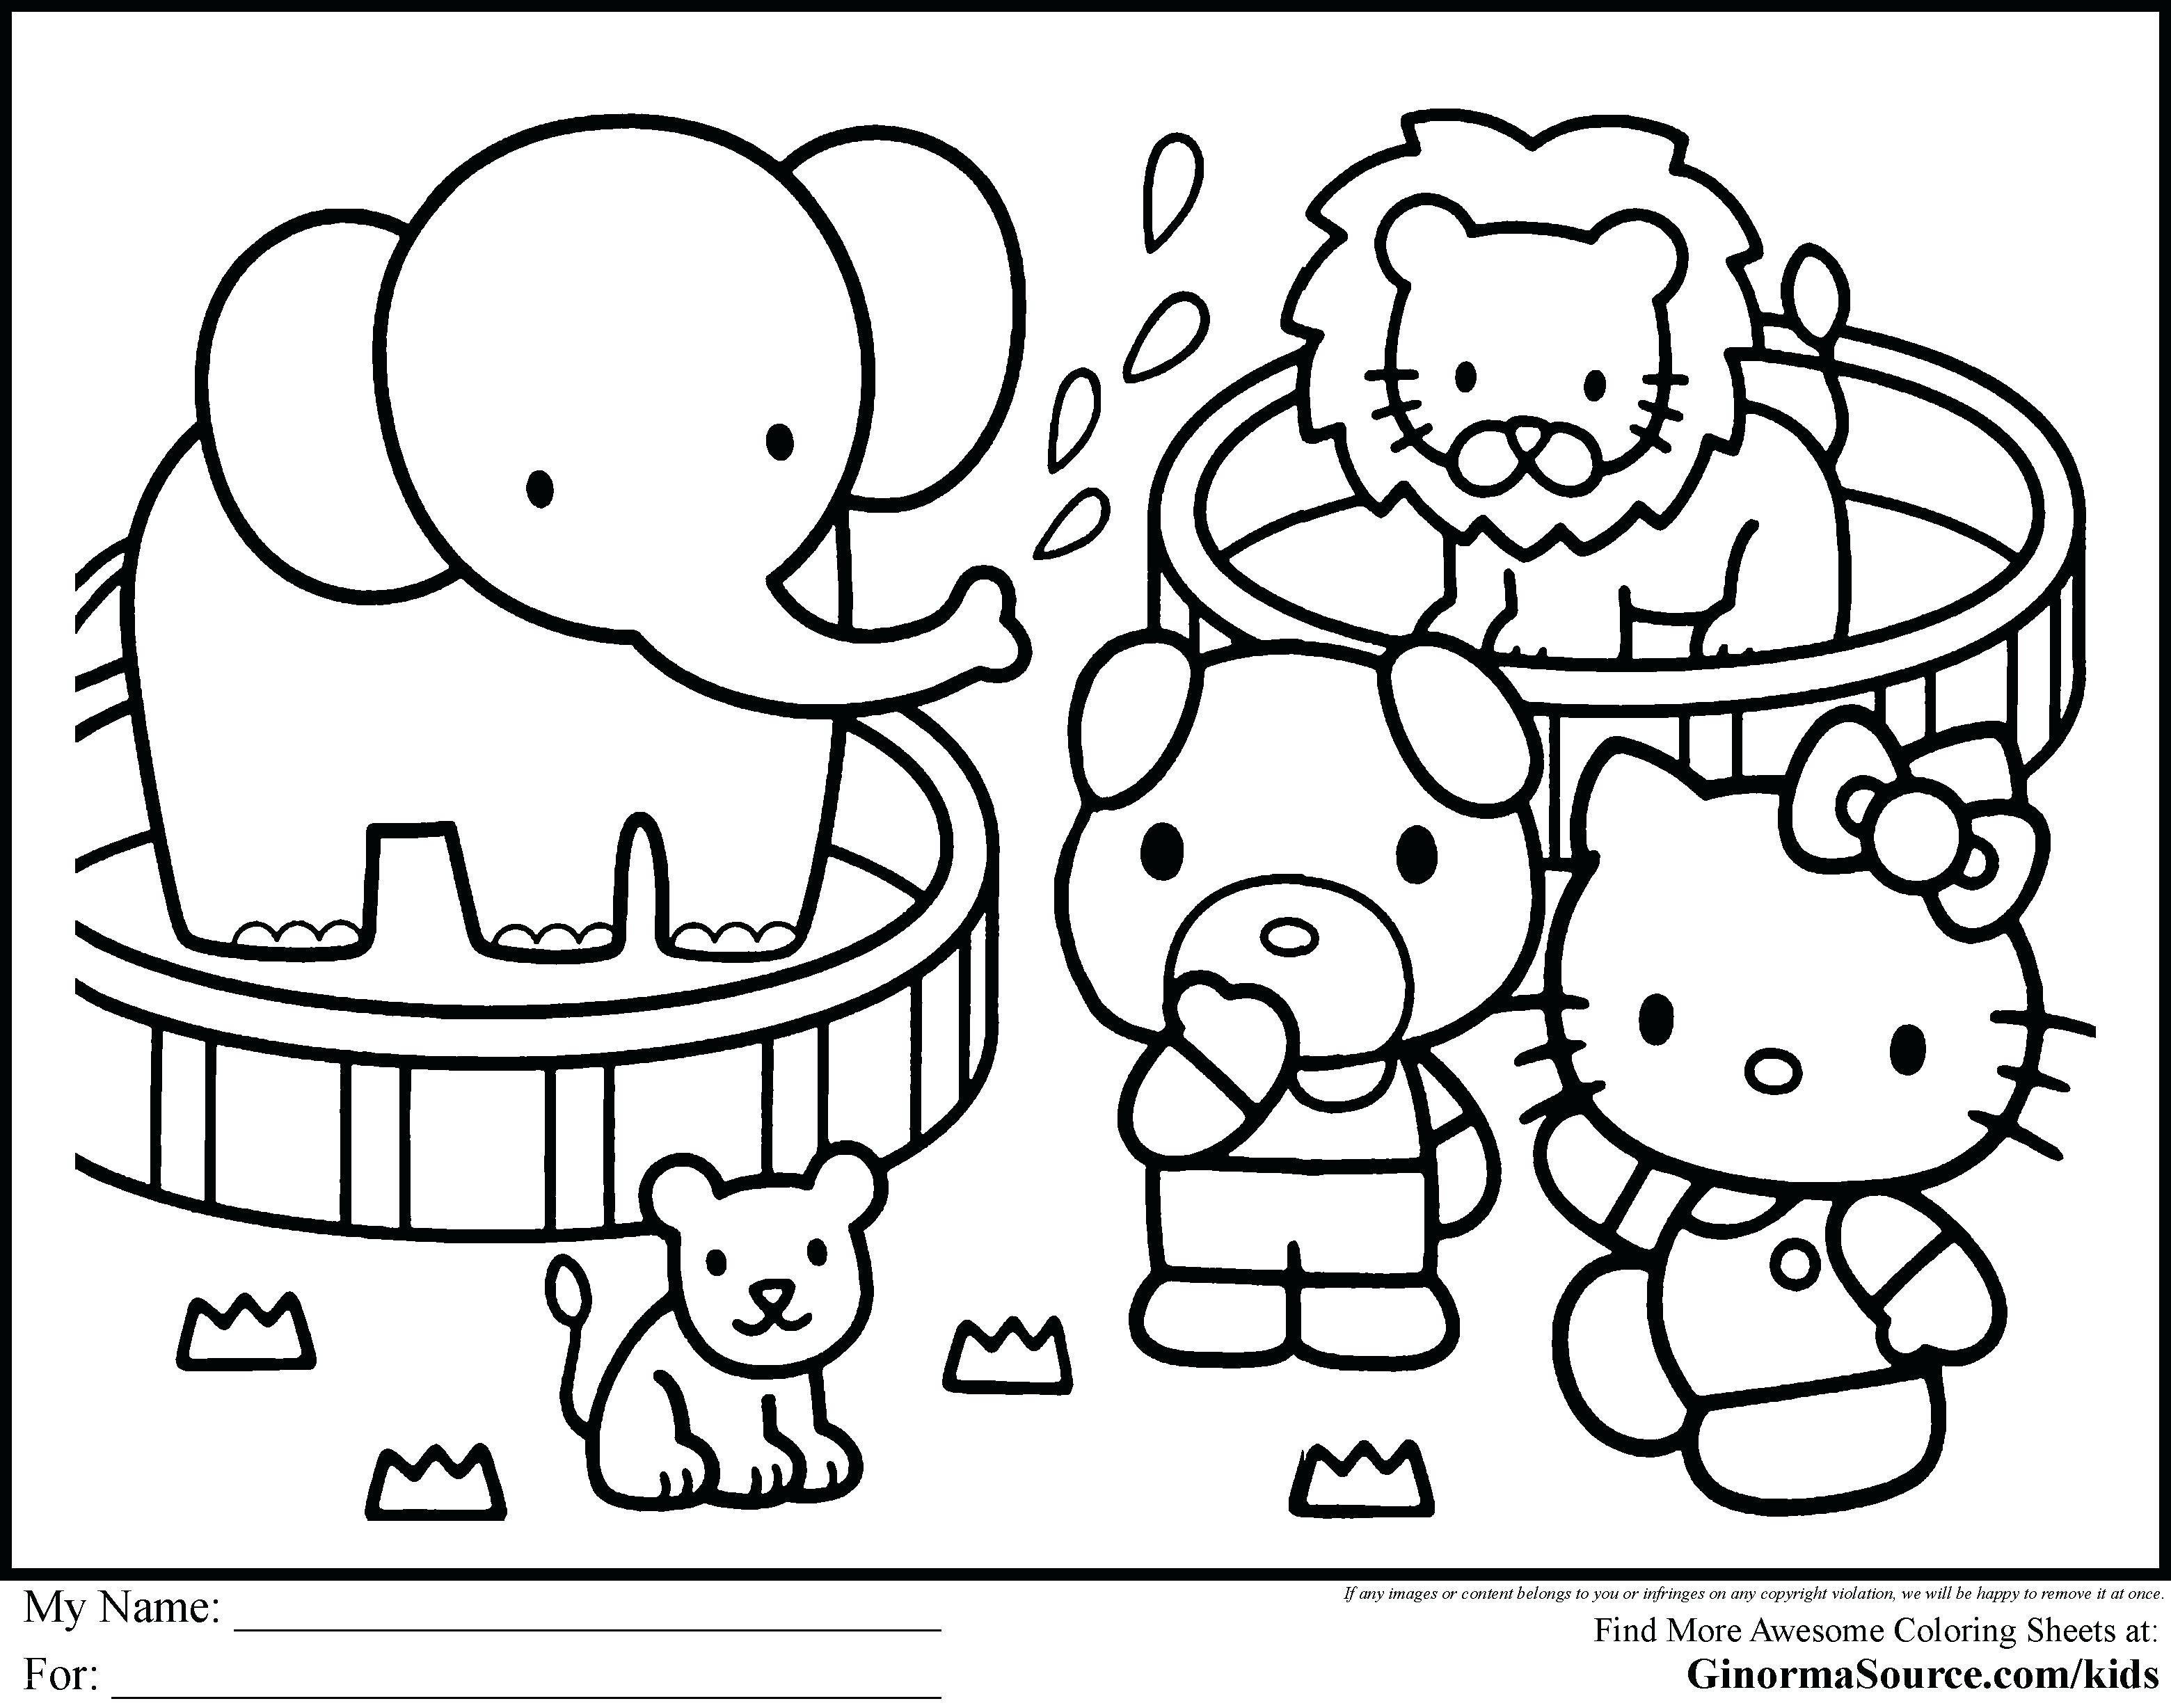 Hello Kitty Ausmalbild Inspirierend 40 Ausmalbilder Emoji Scoredatscore Elegant Hello Kitty Ausmalbilder Fotografieren